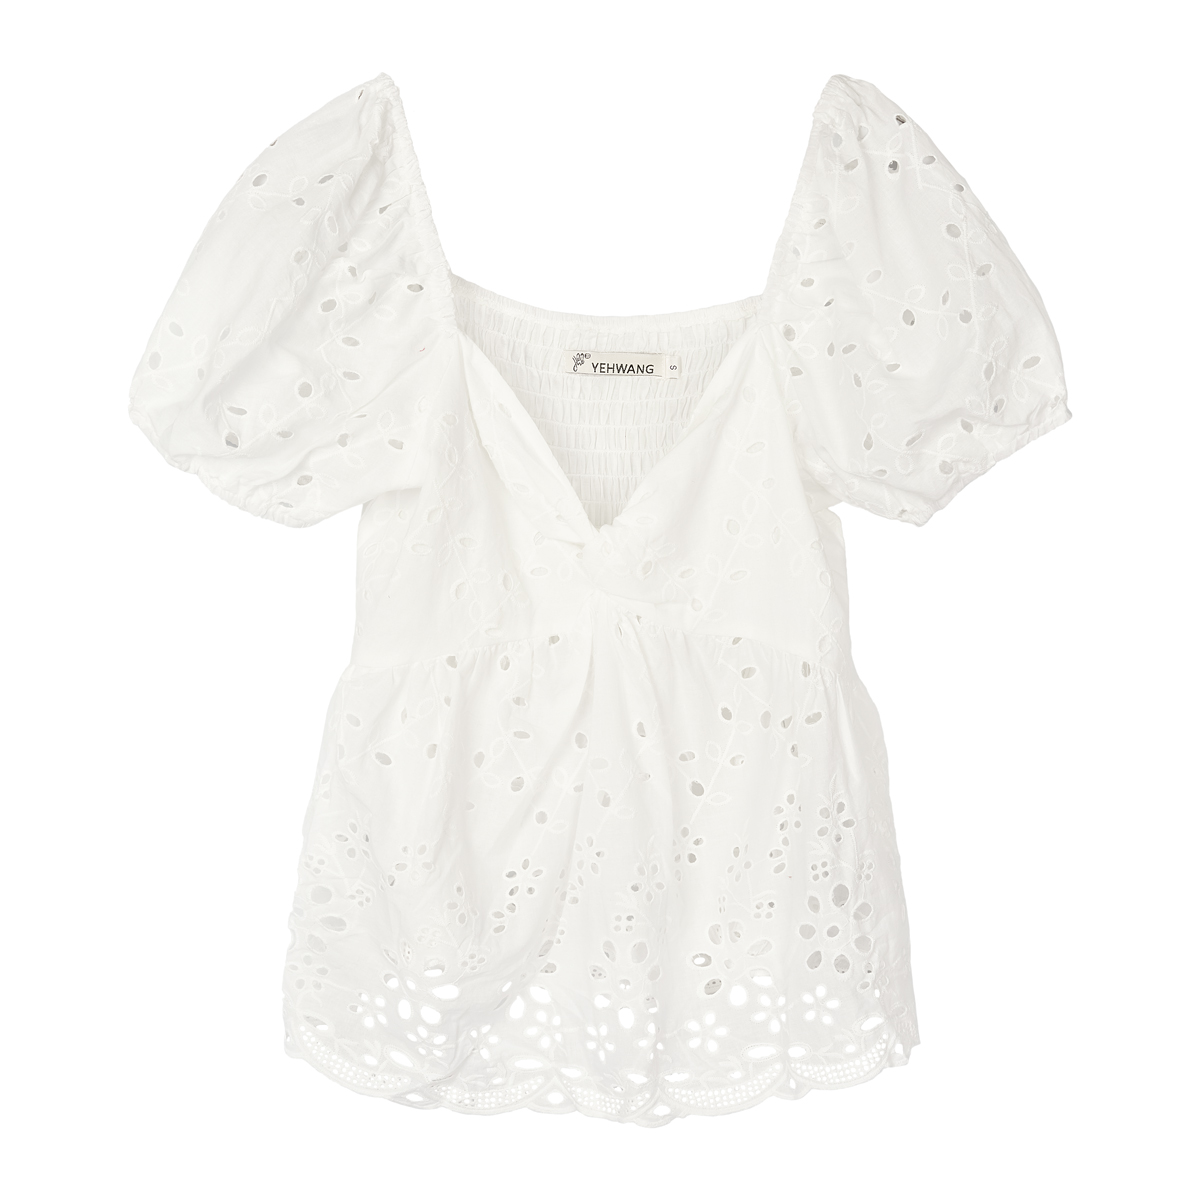 Top Maeve wit witte broderie dames topjes knoop detail trendy fashion kleding truitjes topjes kopen katoen bestellen